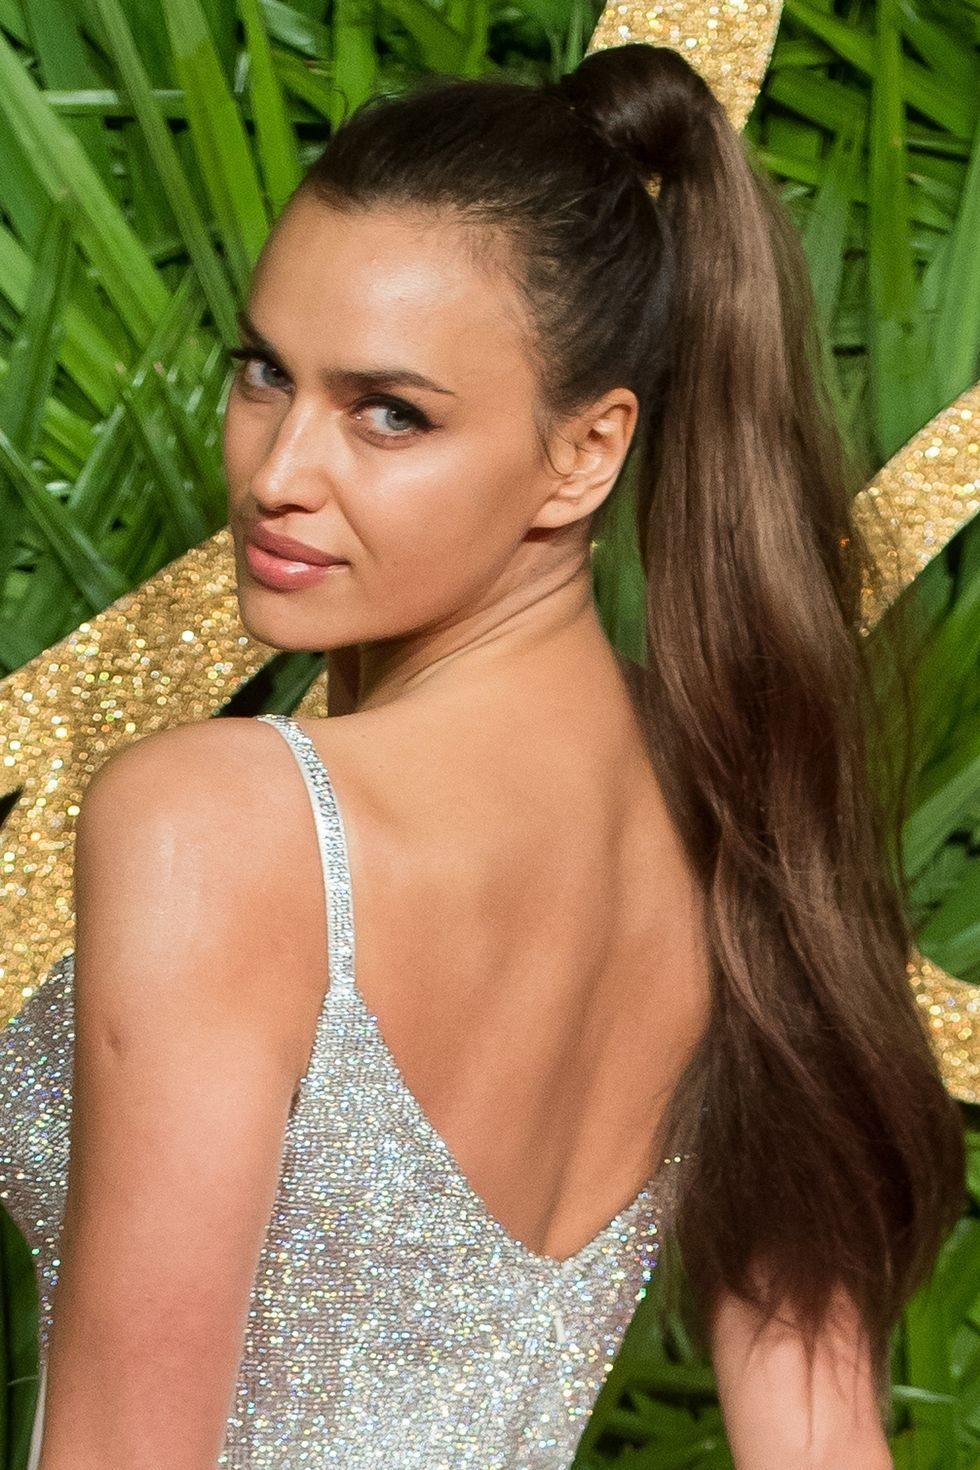 19 sexy ιδέες για να ανανεώσεις τα μαλλιά σου! - Eli.gr 04fc4b9089f